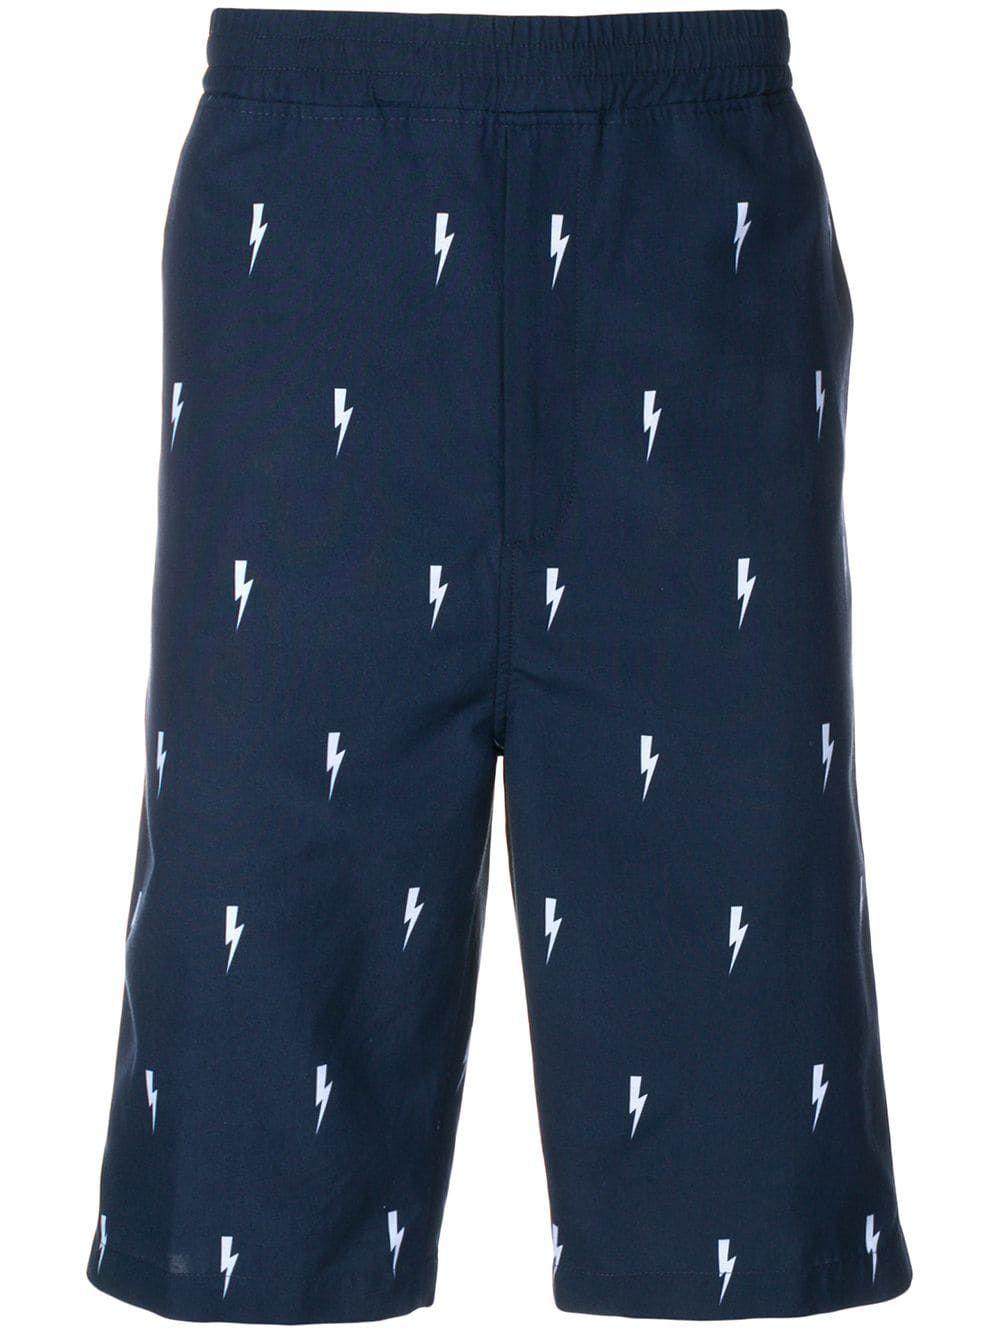 c115b37dd6 Neil Barrett lightning bolt track shorts - Blue | Products in 2019 ...